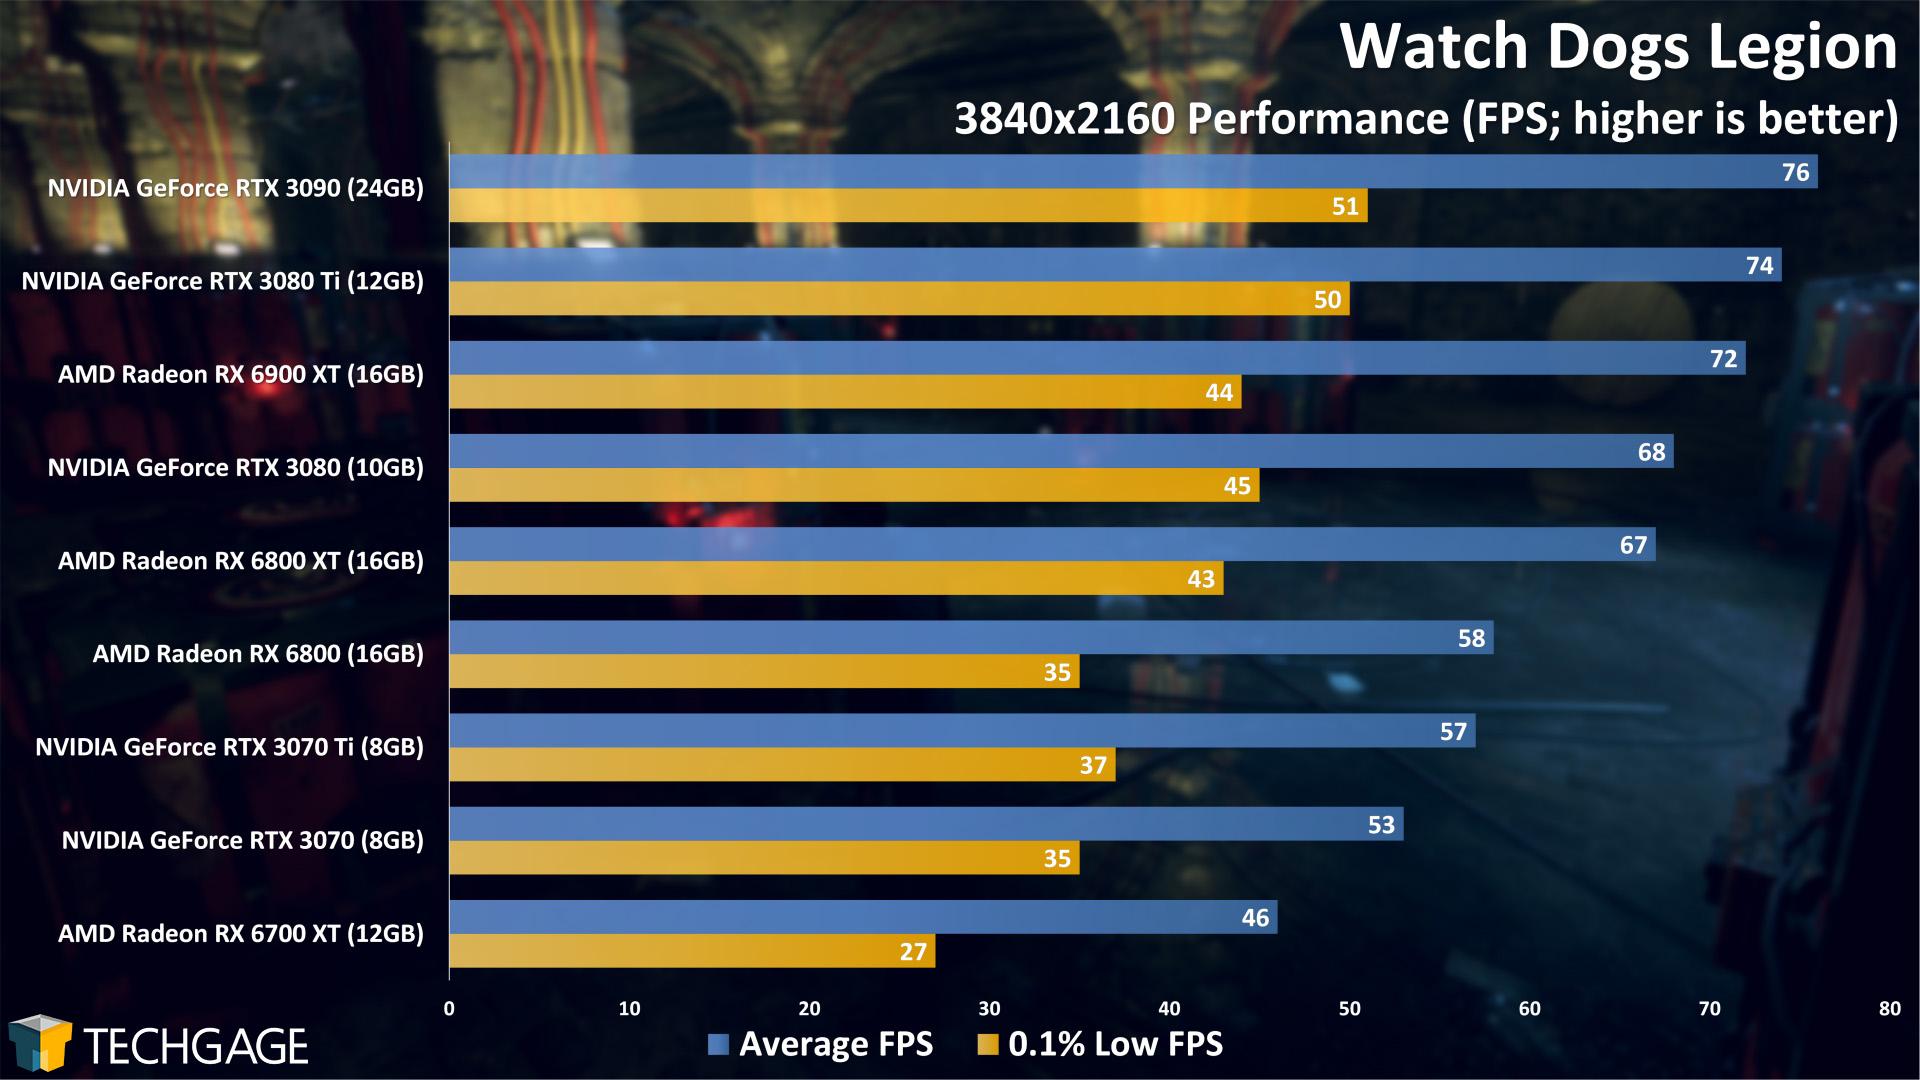 Watch Dogs Legion - 2160p Performance (NVIDIA GeForce RTX 3070 Ti)